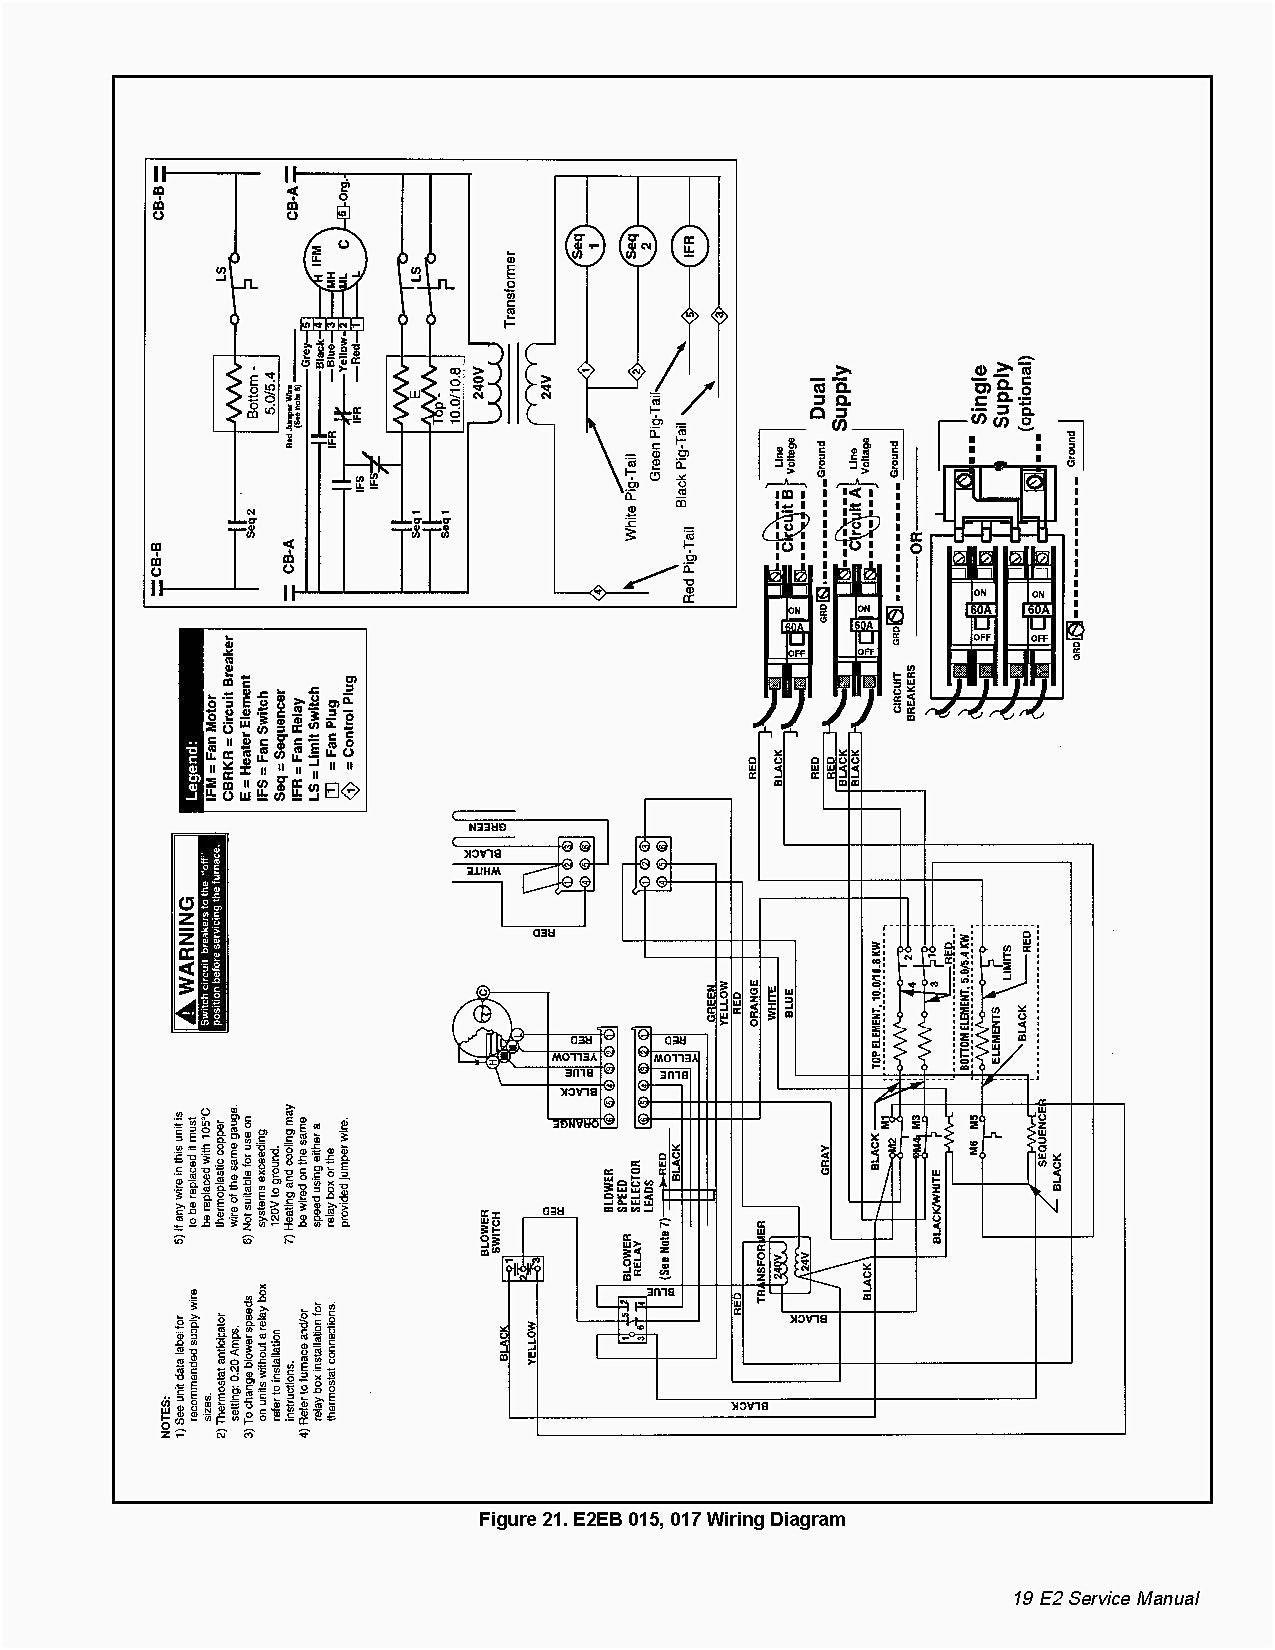 Unique Wiring Diagram for American Standard Gas Furnace #diagram  #diagramsample #diagramtemplate #wiringdiagram… | Electric furnace, Furnace,  Trailer wiring diagramPinterest